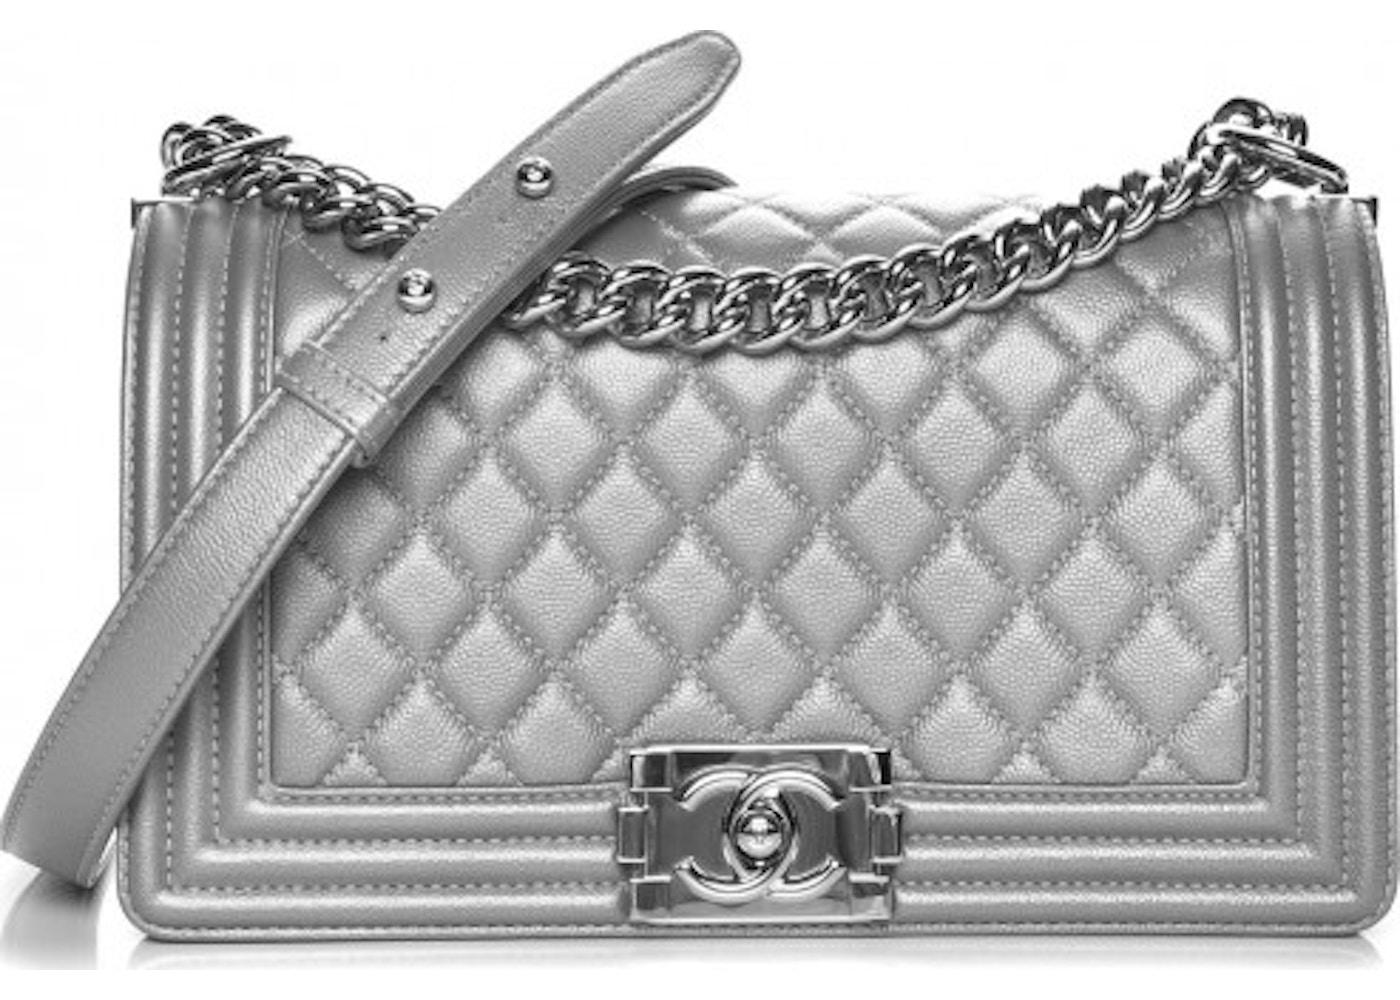 d01628272e95 Chanel Boy Flap Diamond Quilted Metallic Medium Silver. Diamond Quilted  Metallic Medium Silver